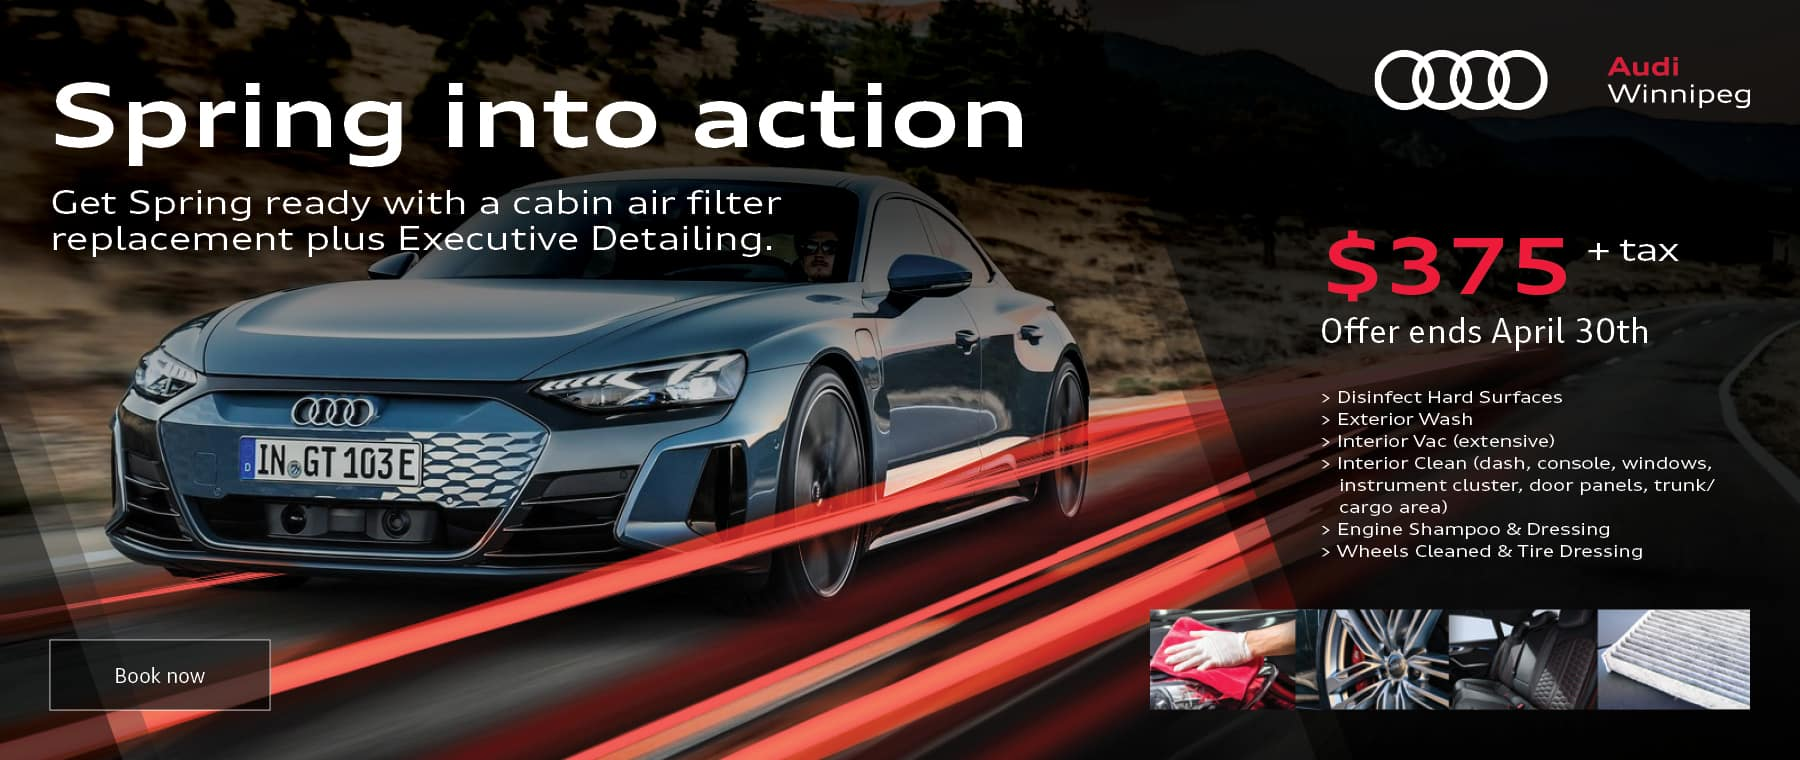 Audi-Wpg-Spring-Refresh – Web-Banner